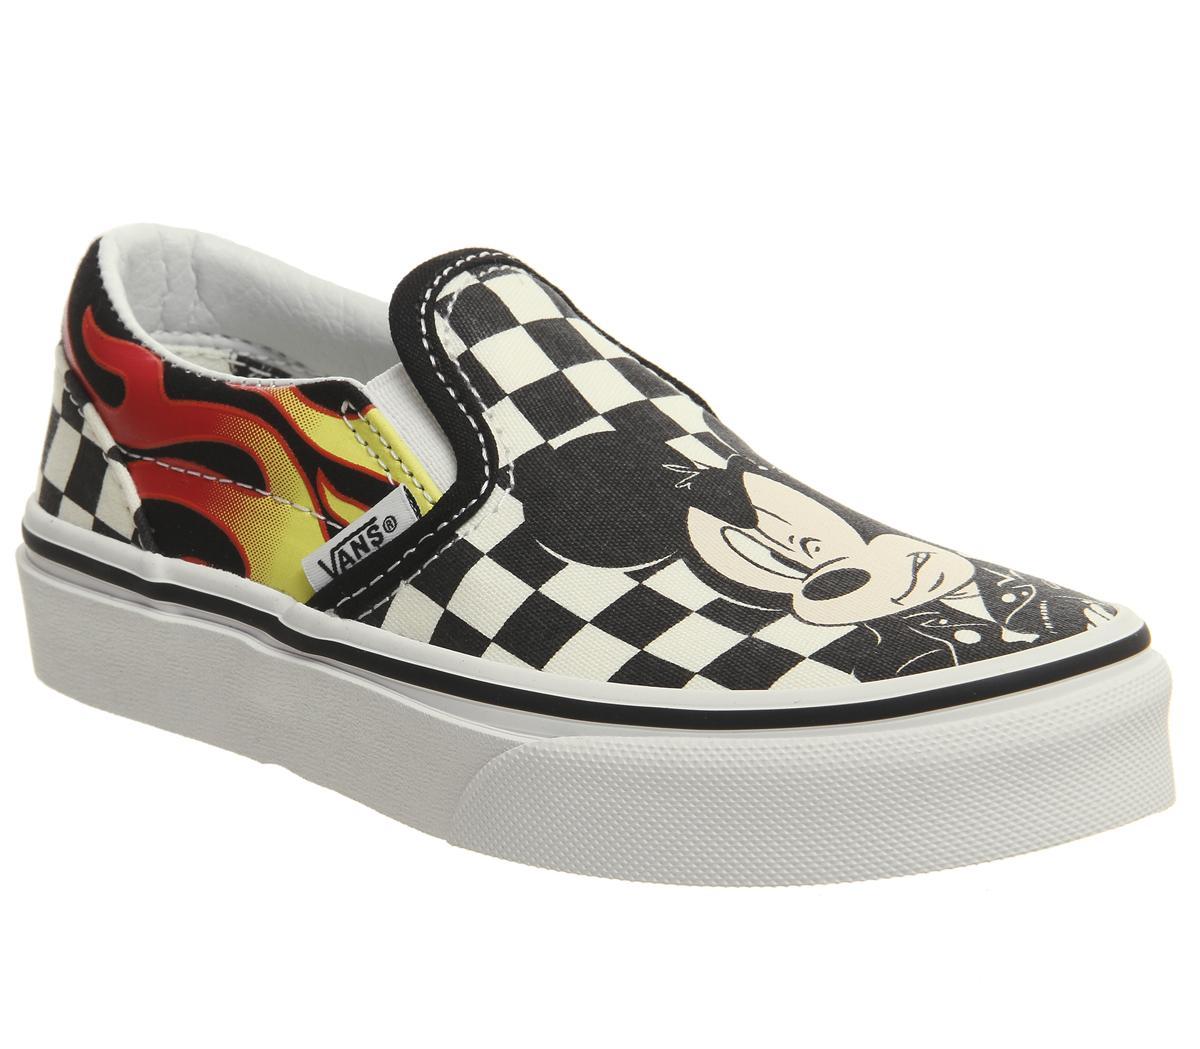 católico Huracán Locura  Vans Classic Slip On Kids Trainers Mickey And Minnie Checker Flame Disney -  Unisex